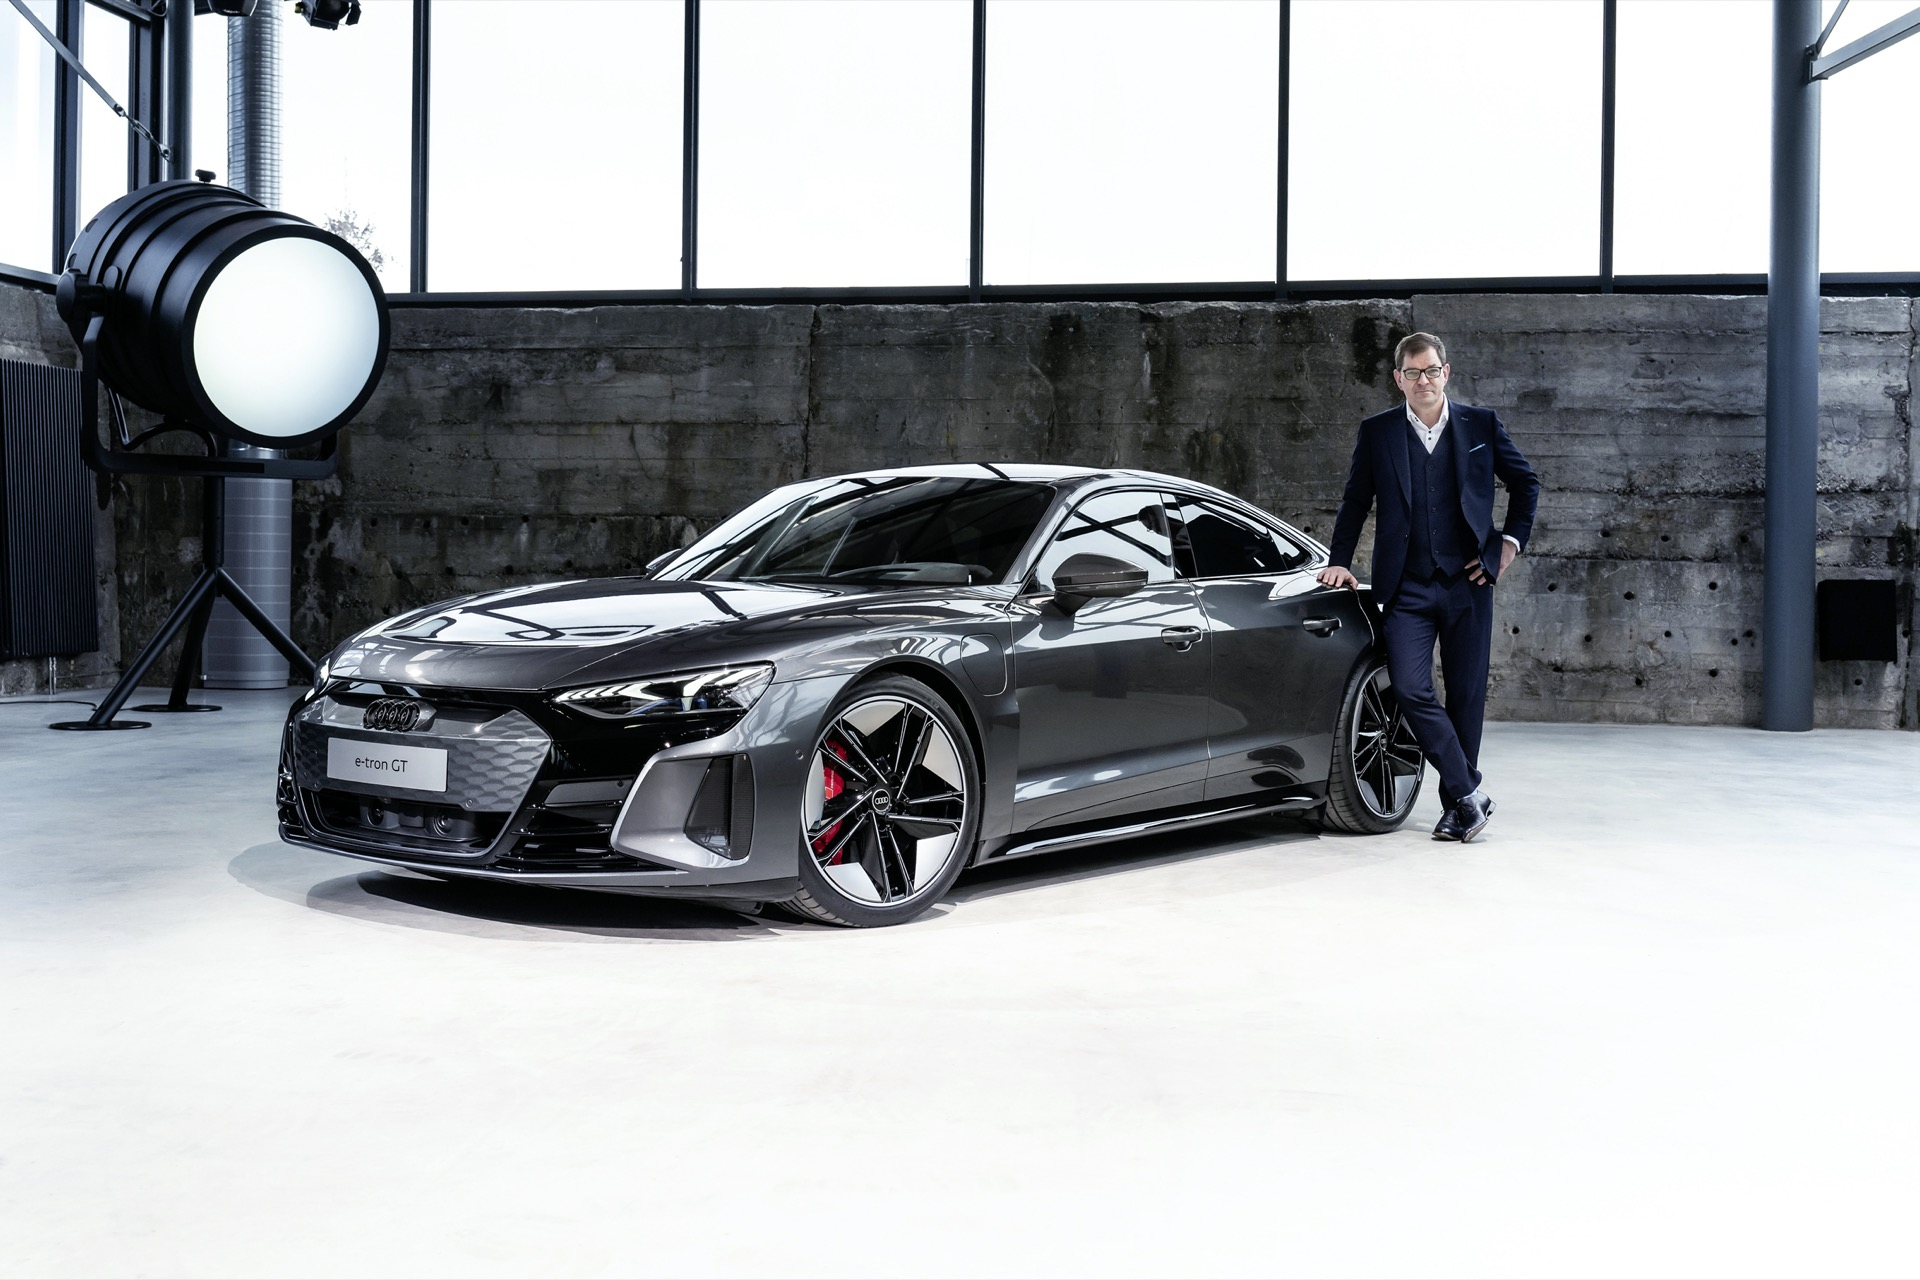 2022 Audi E-Tron GT Quattro First Drive Review: Amuse-Bouche